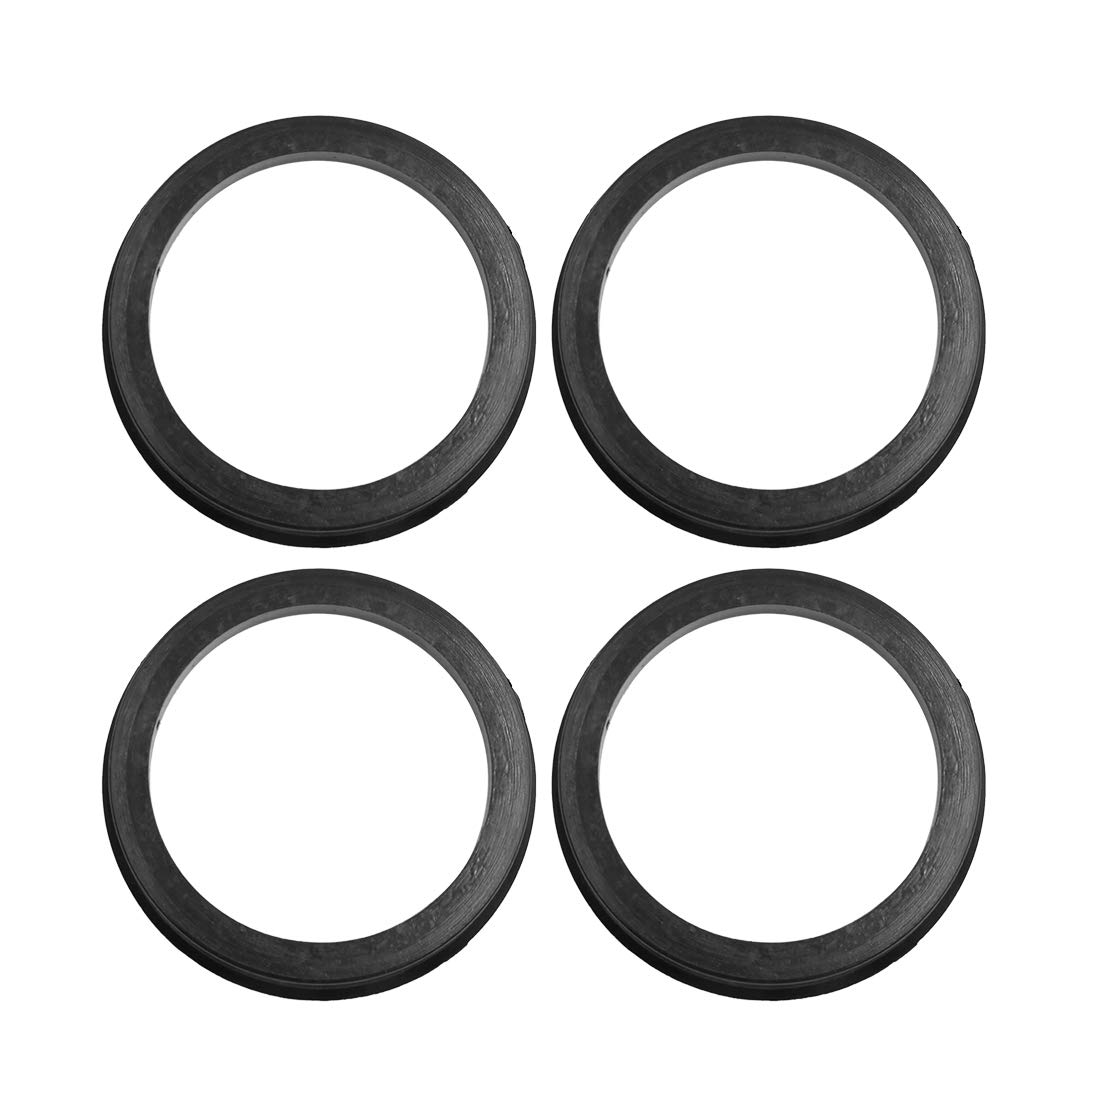 X AUTOHAUX Car Hub Centric Rings Wheel Center Bore 73.1 to 54.1mm 4pcs Black Plastic